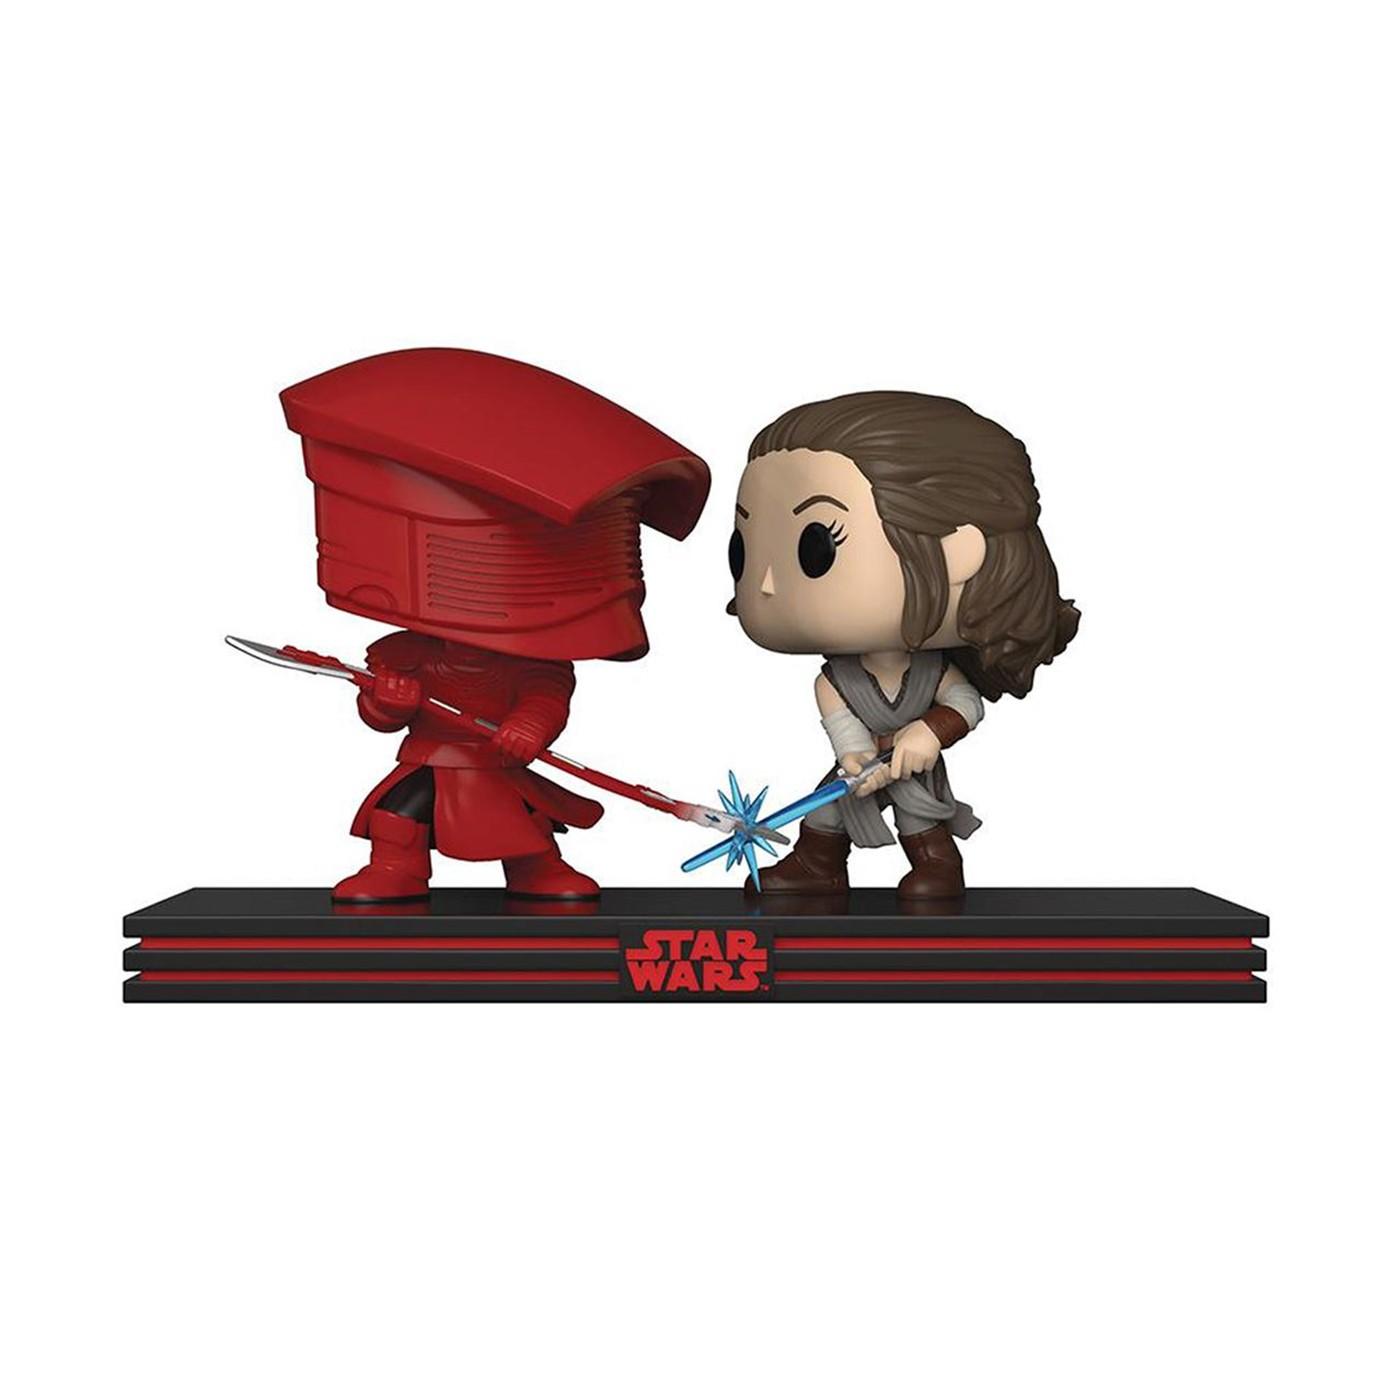 Rey & Praetorian Guard Funko Pop Movie Moment